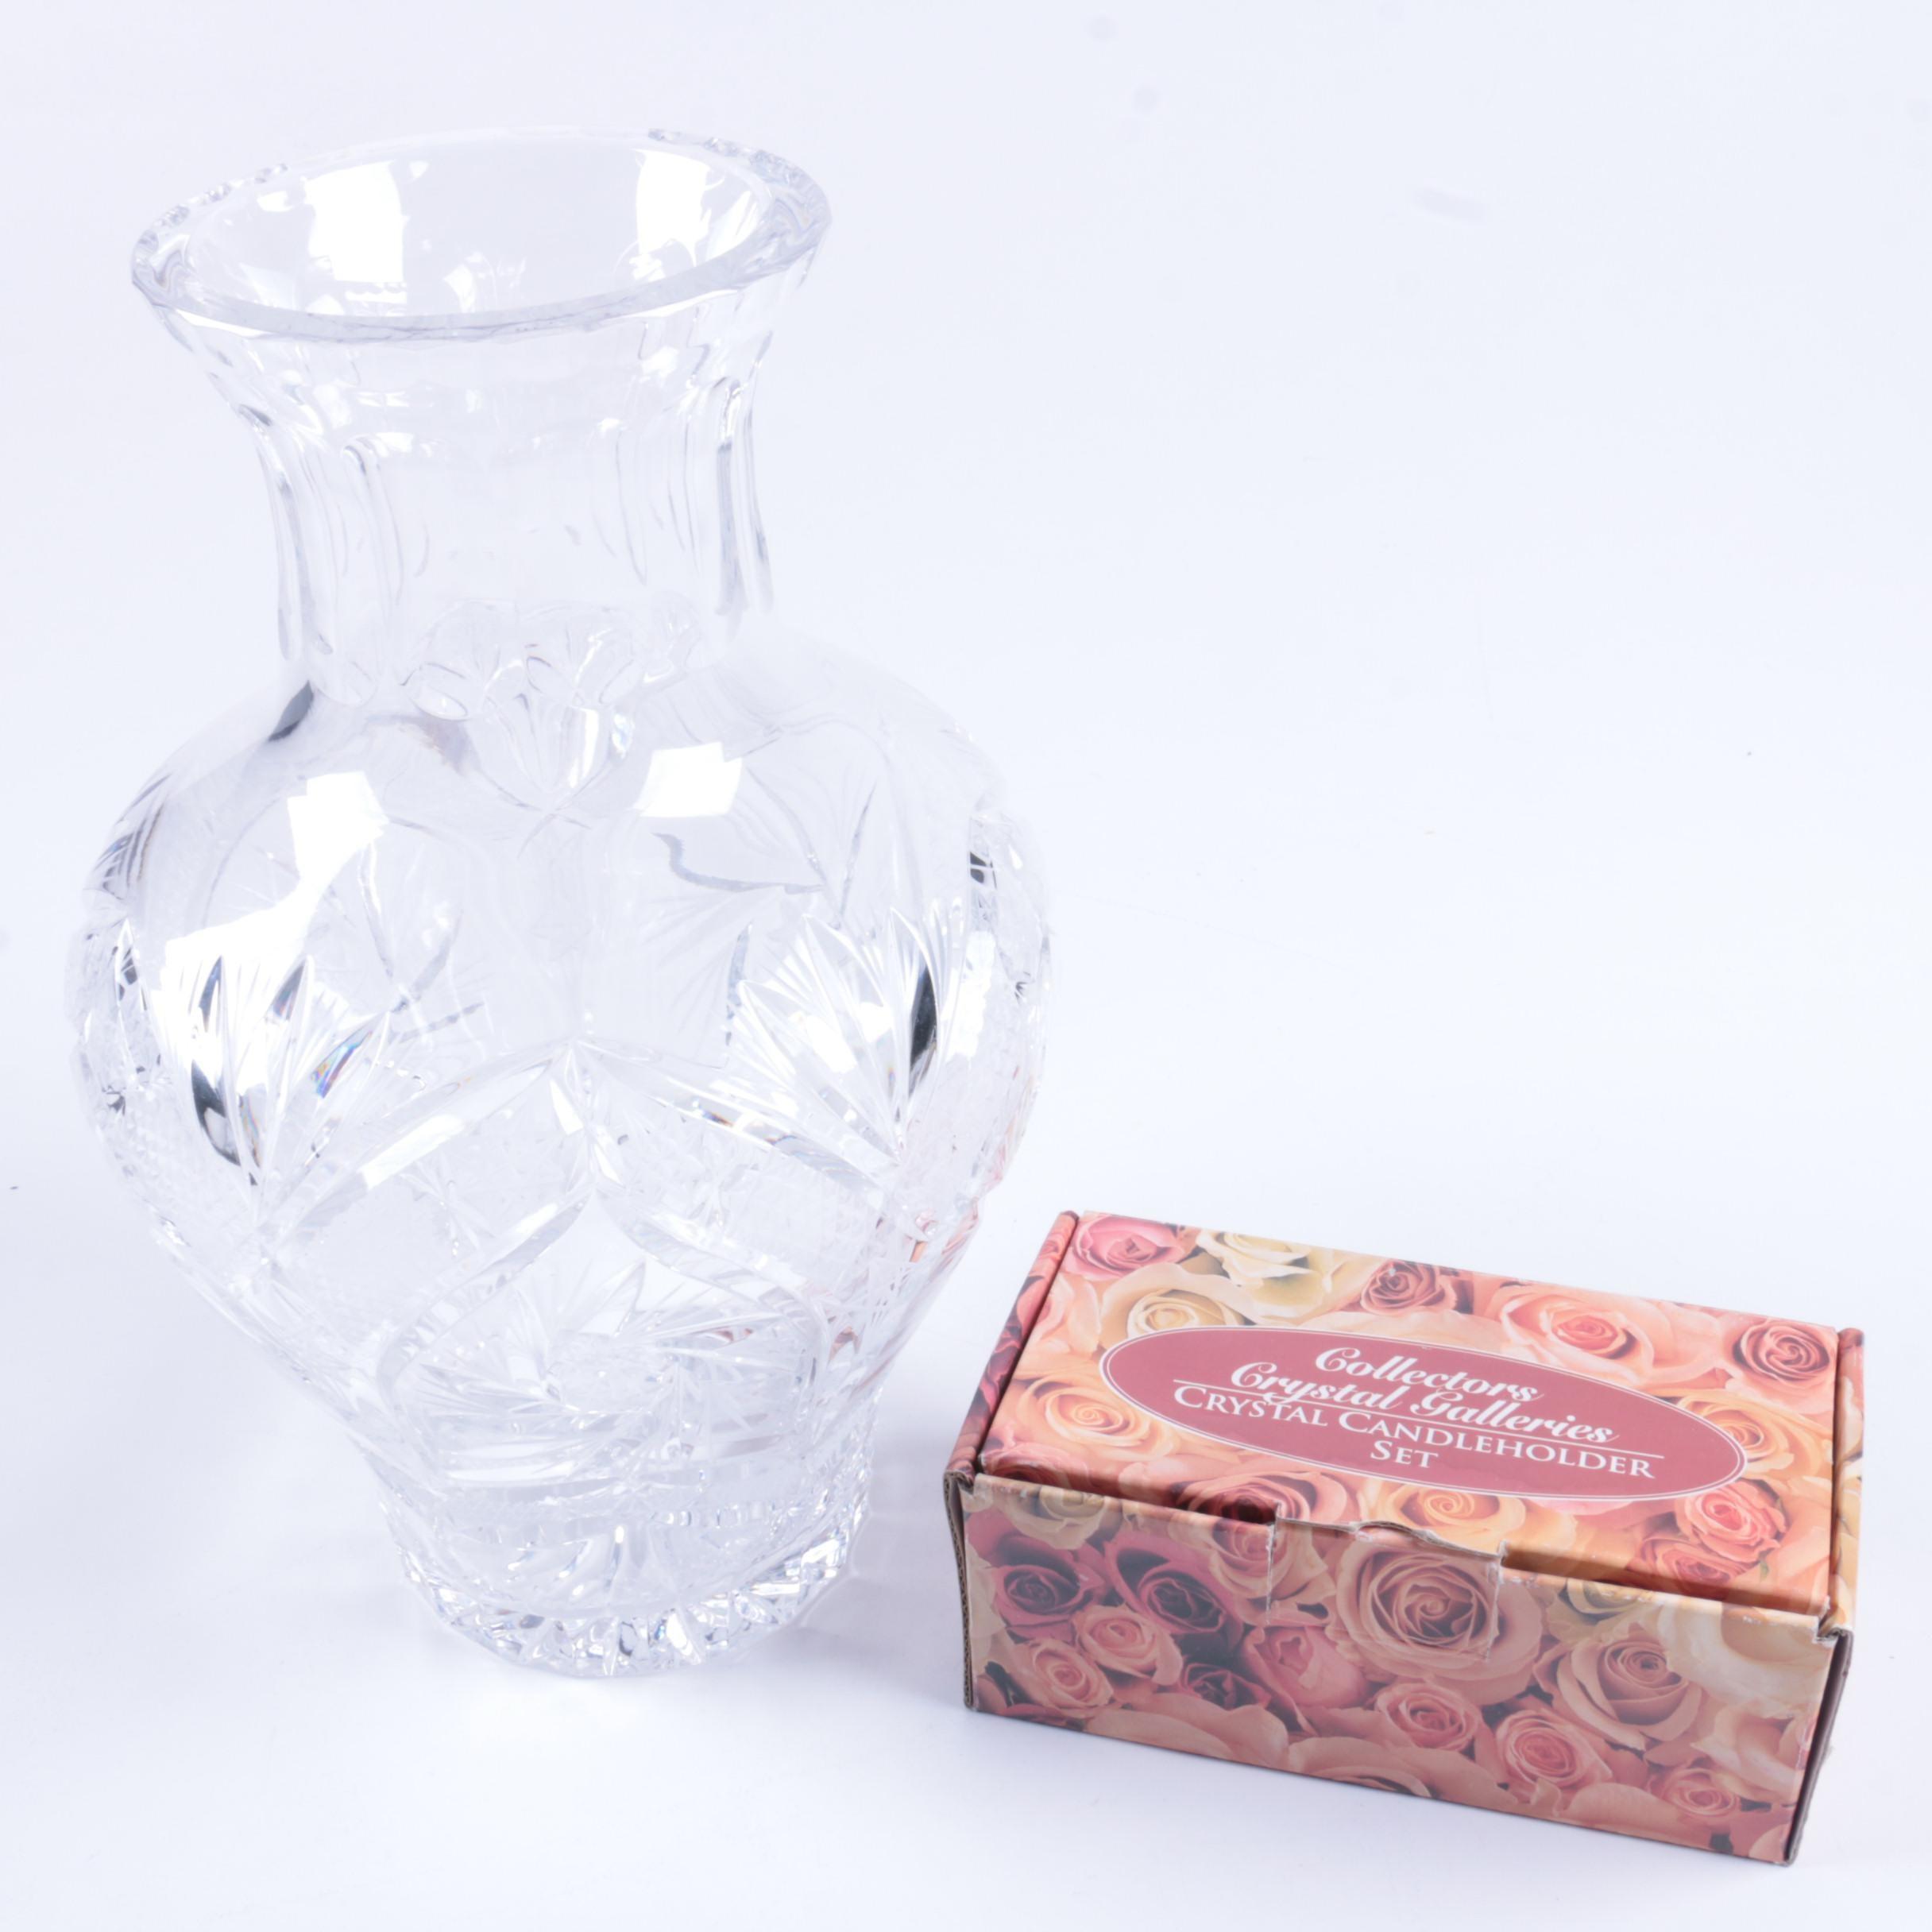 Vintage Crystal Vase and Candleholders